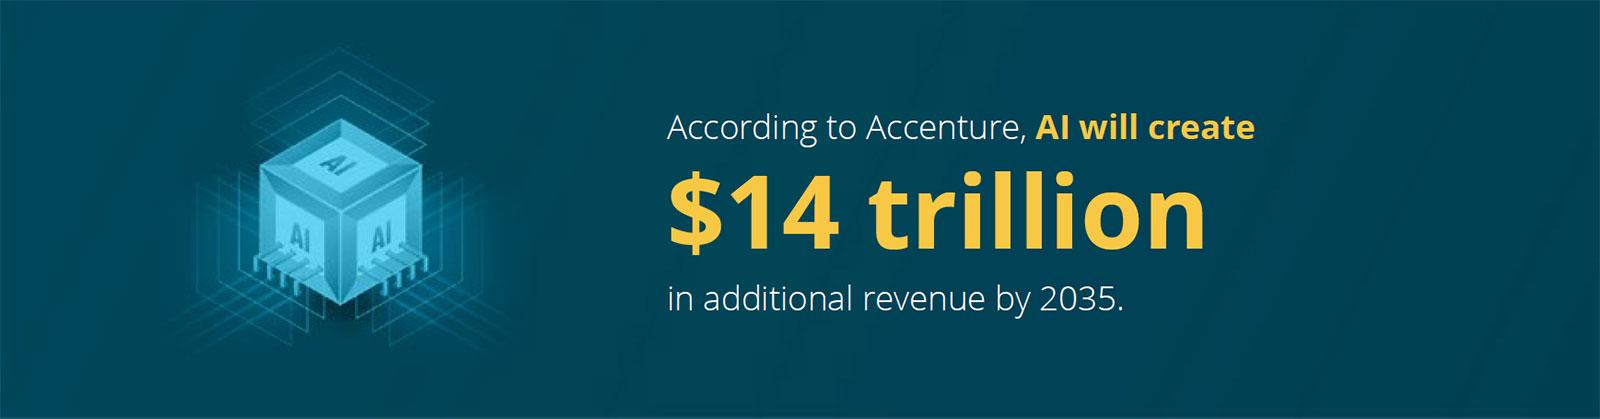 According to Accenture, AI will create $14 trillion in additional revenue by 2035.